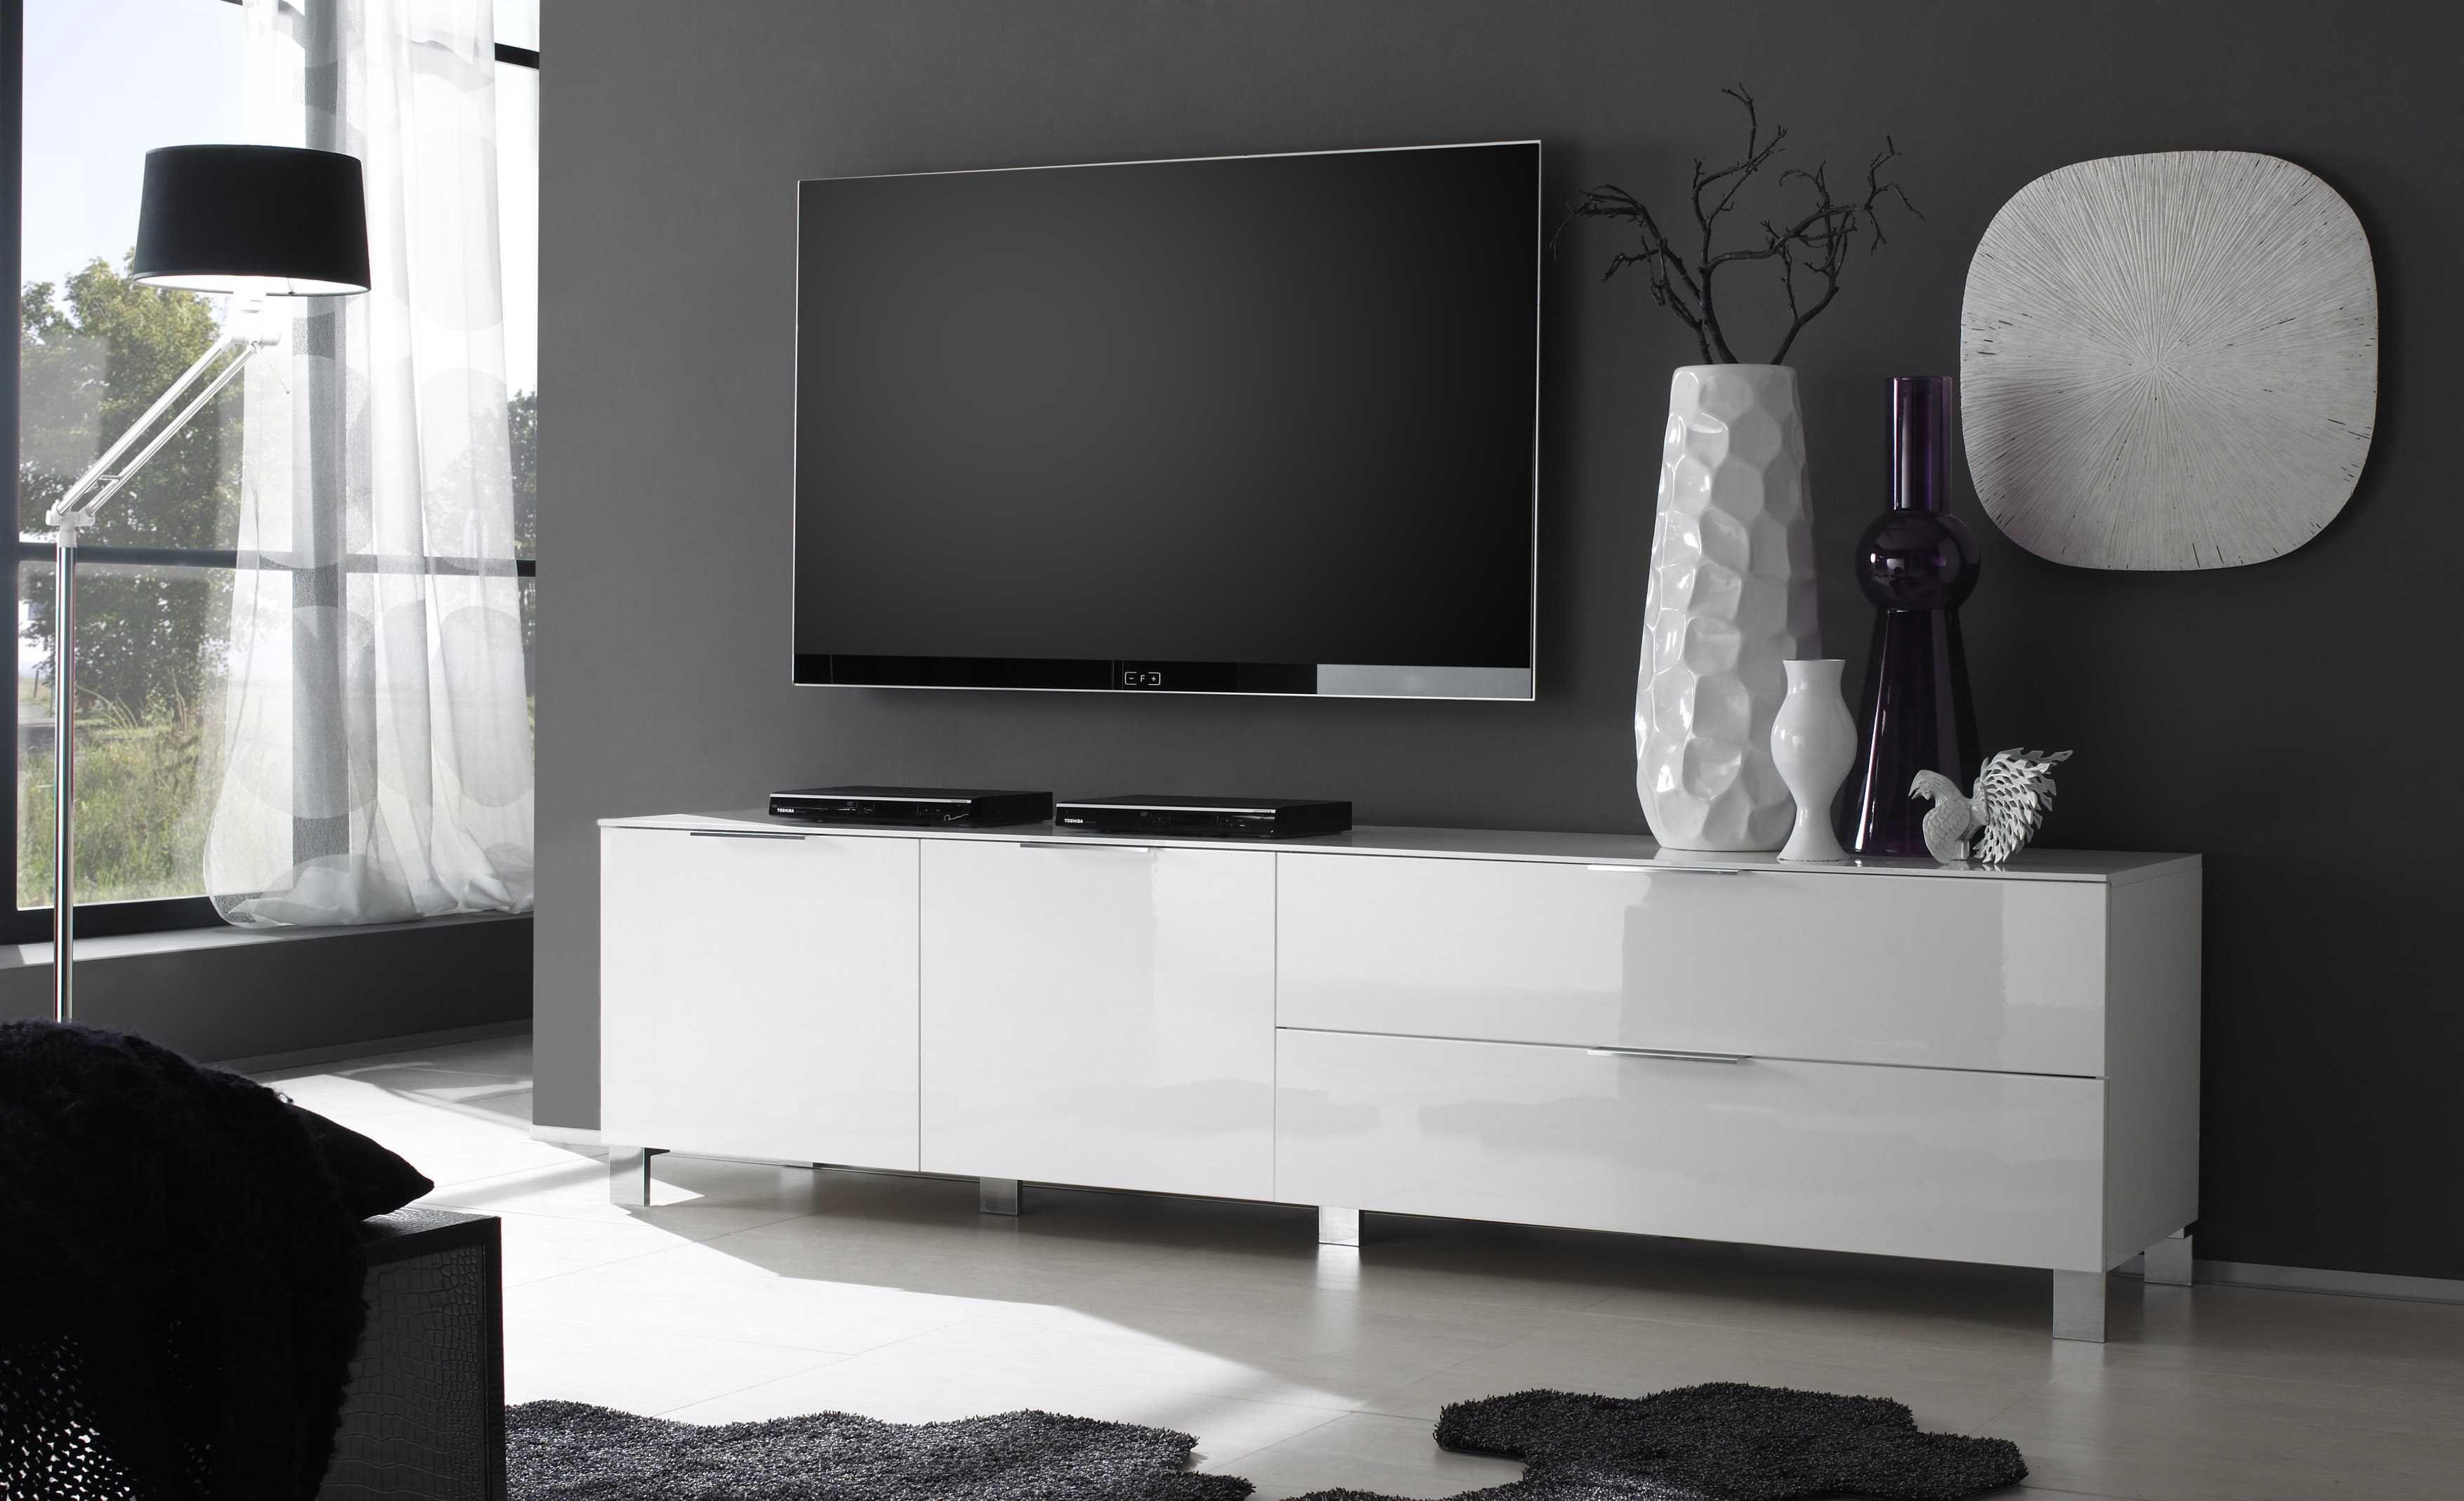 Ikea Wohnwand Ideen Italienisches Lowboard Weiss Lackiert In